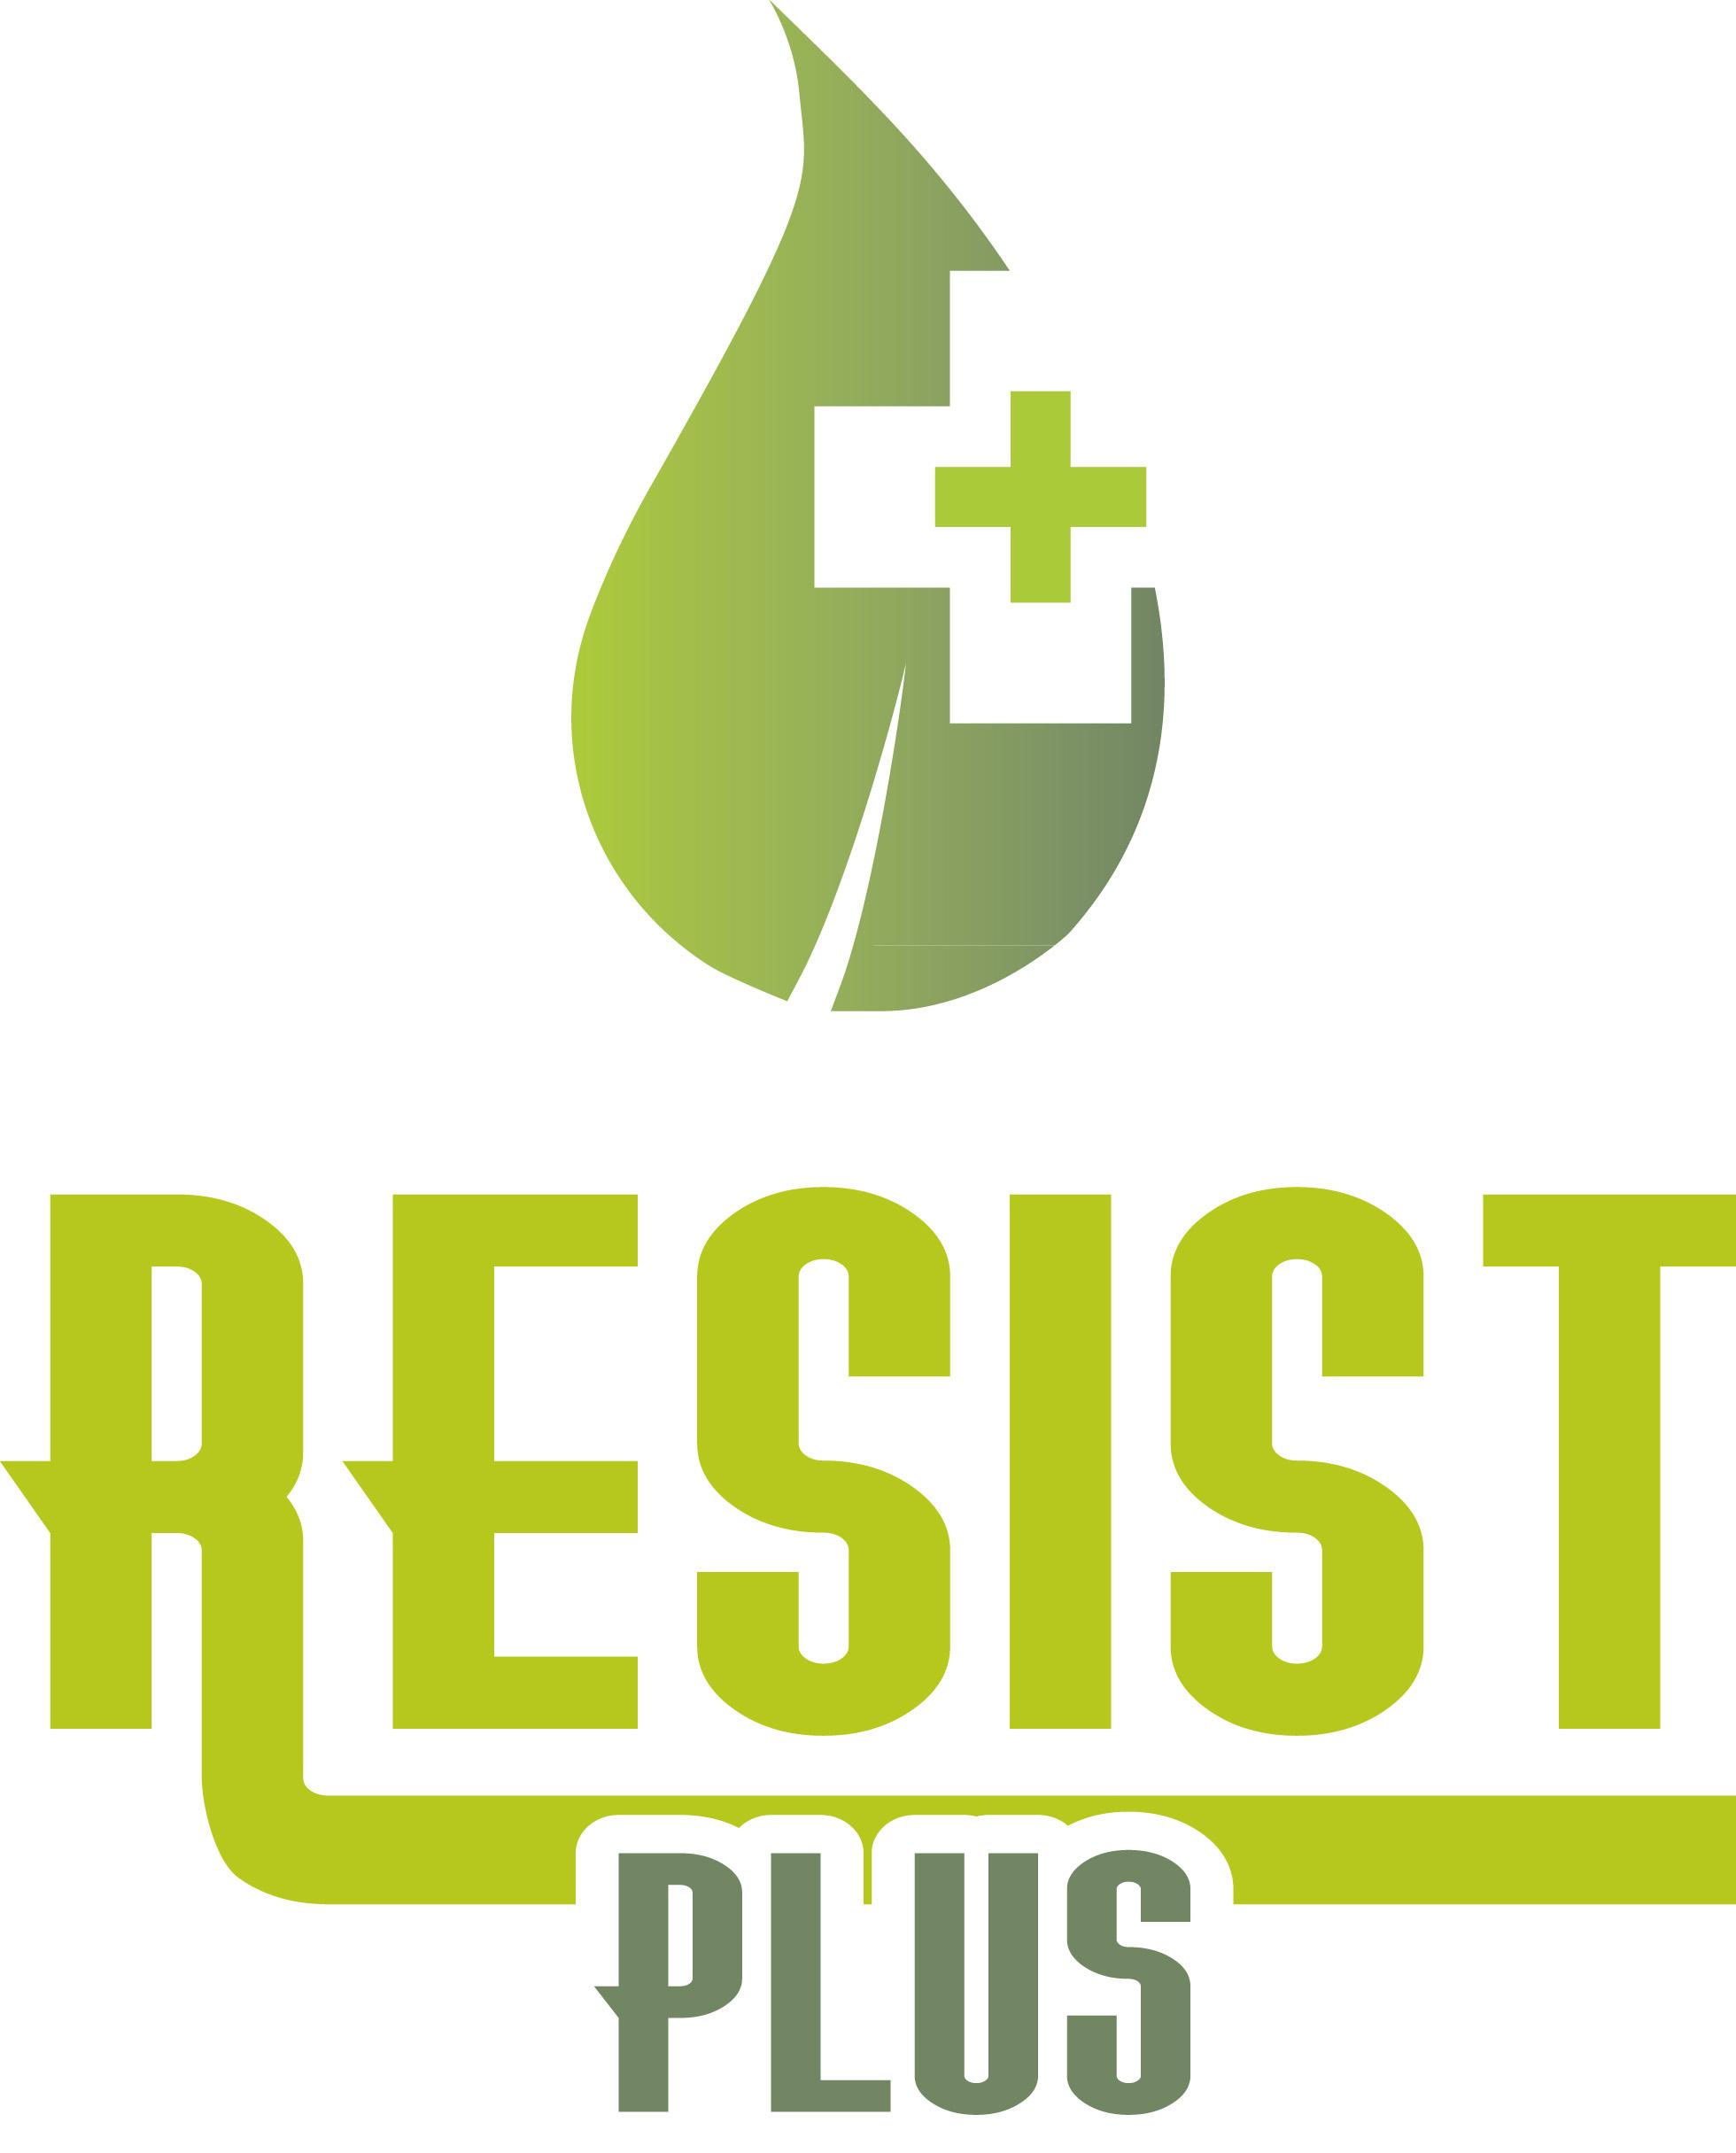 RESIST PLUS